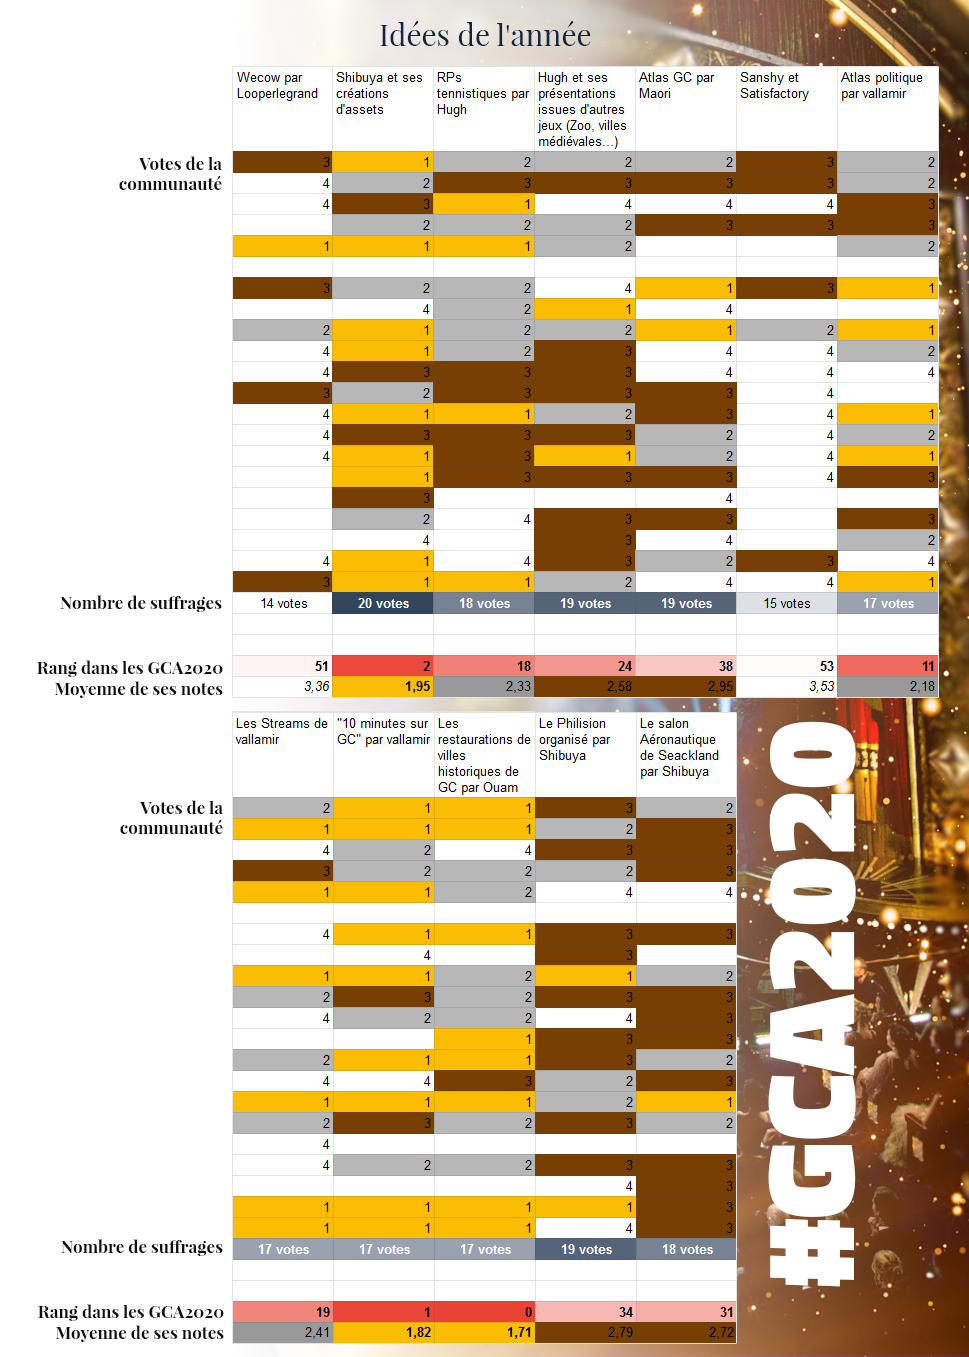 GCA | Les résultats - Page 8 GCA2020_id%C3%A9es